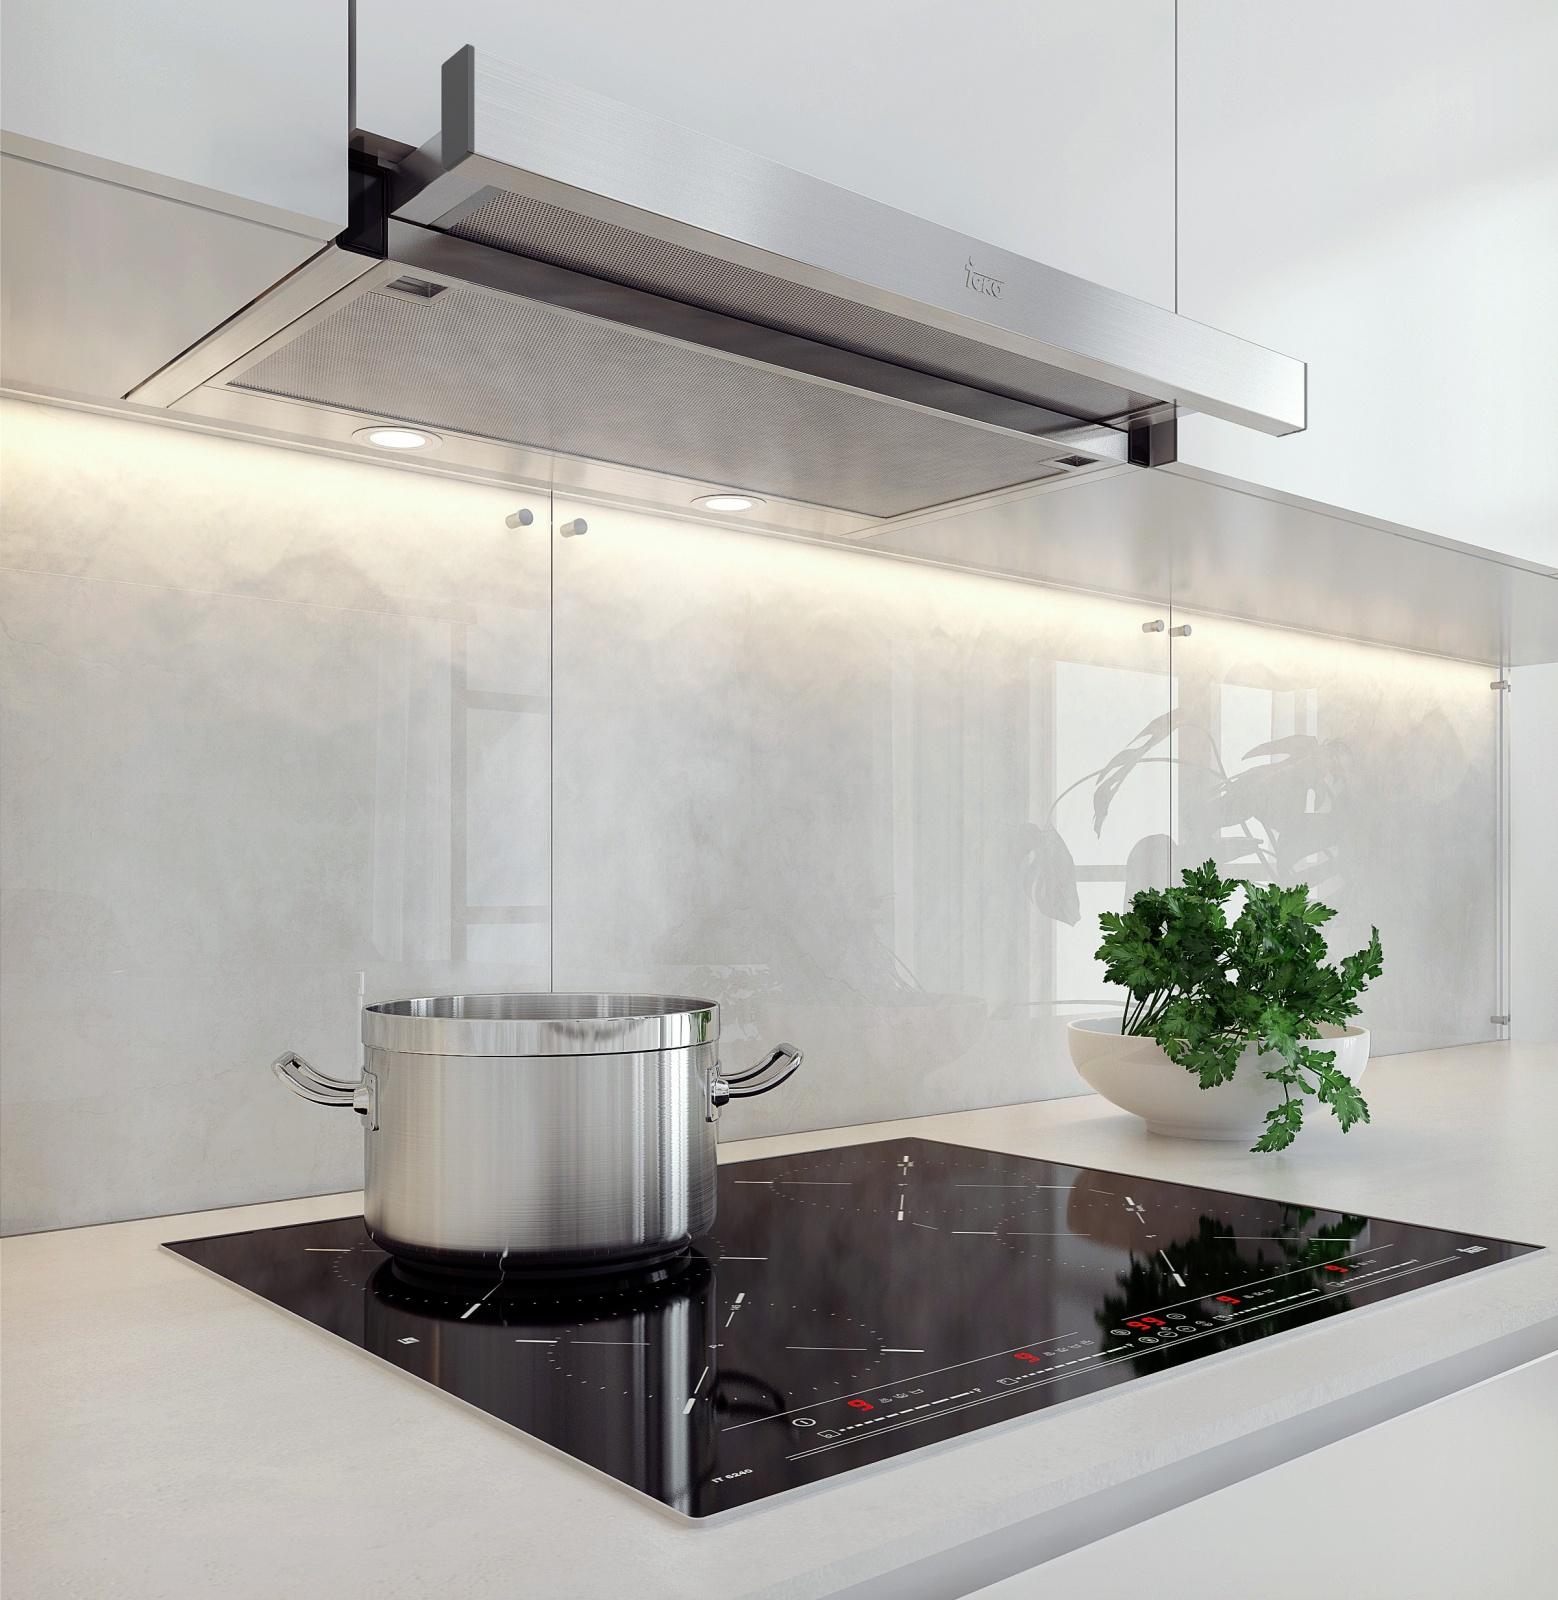 teka hochleistungs edelstahl einbau dunstabzugshaube abzugshaube 694 m3 h esse ebay. Black Bedroom Furniture Sets. Home Design Ideas